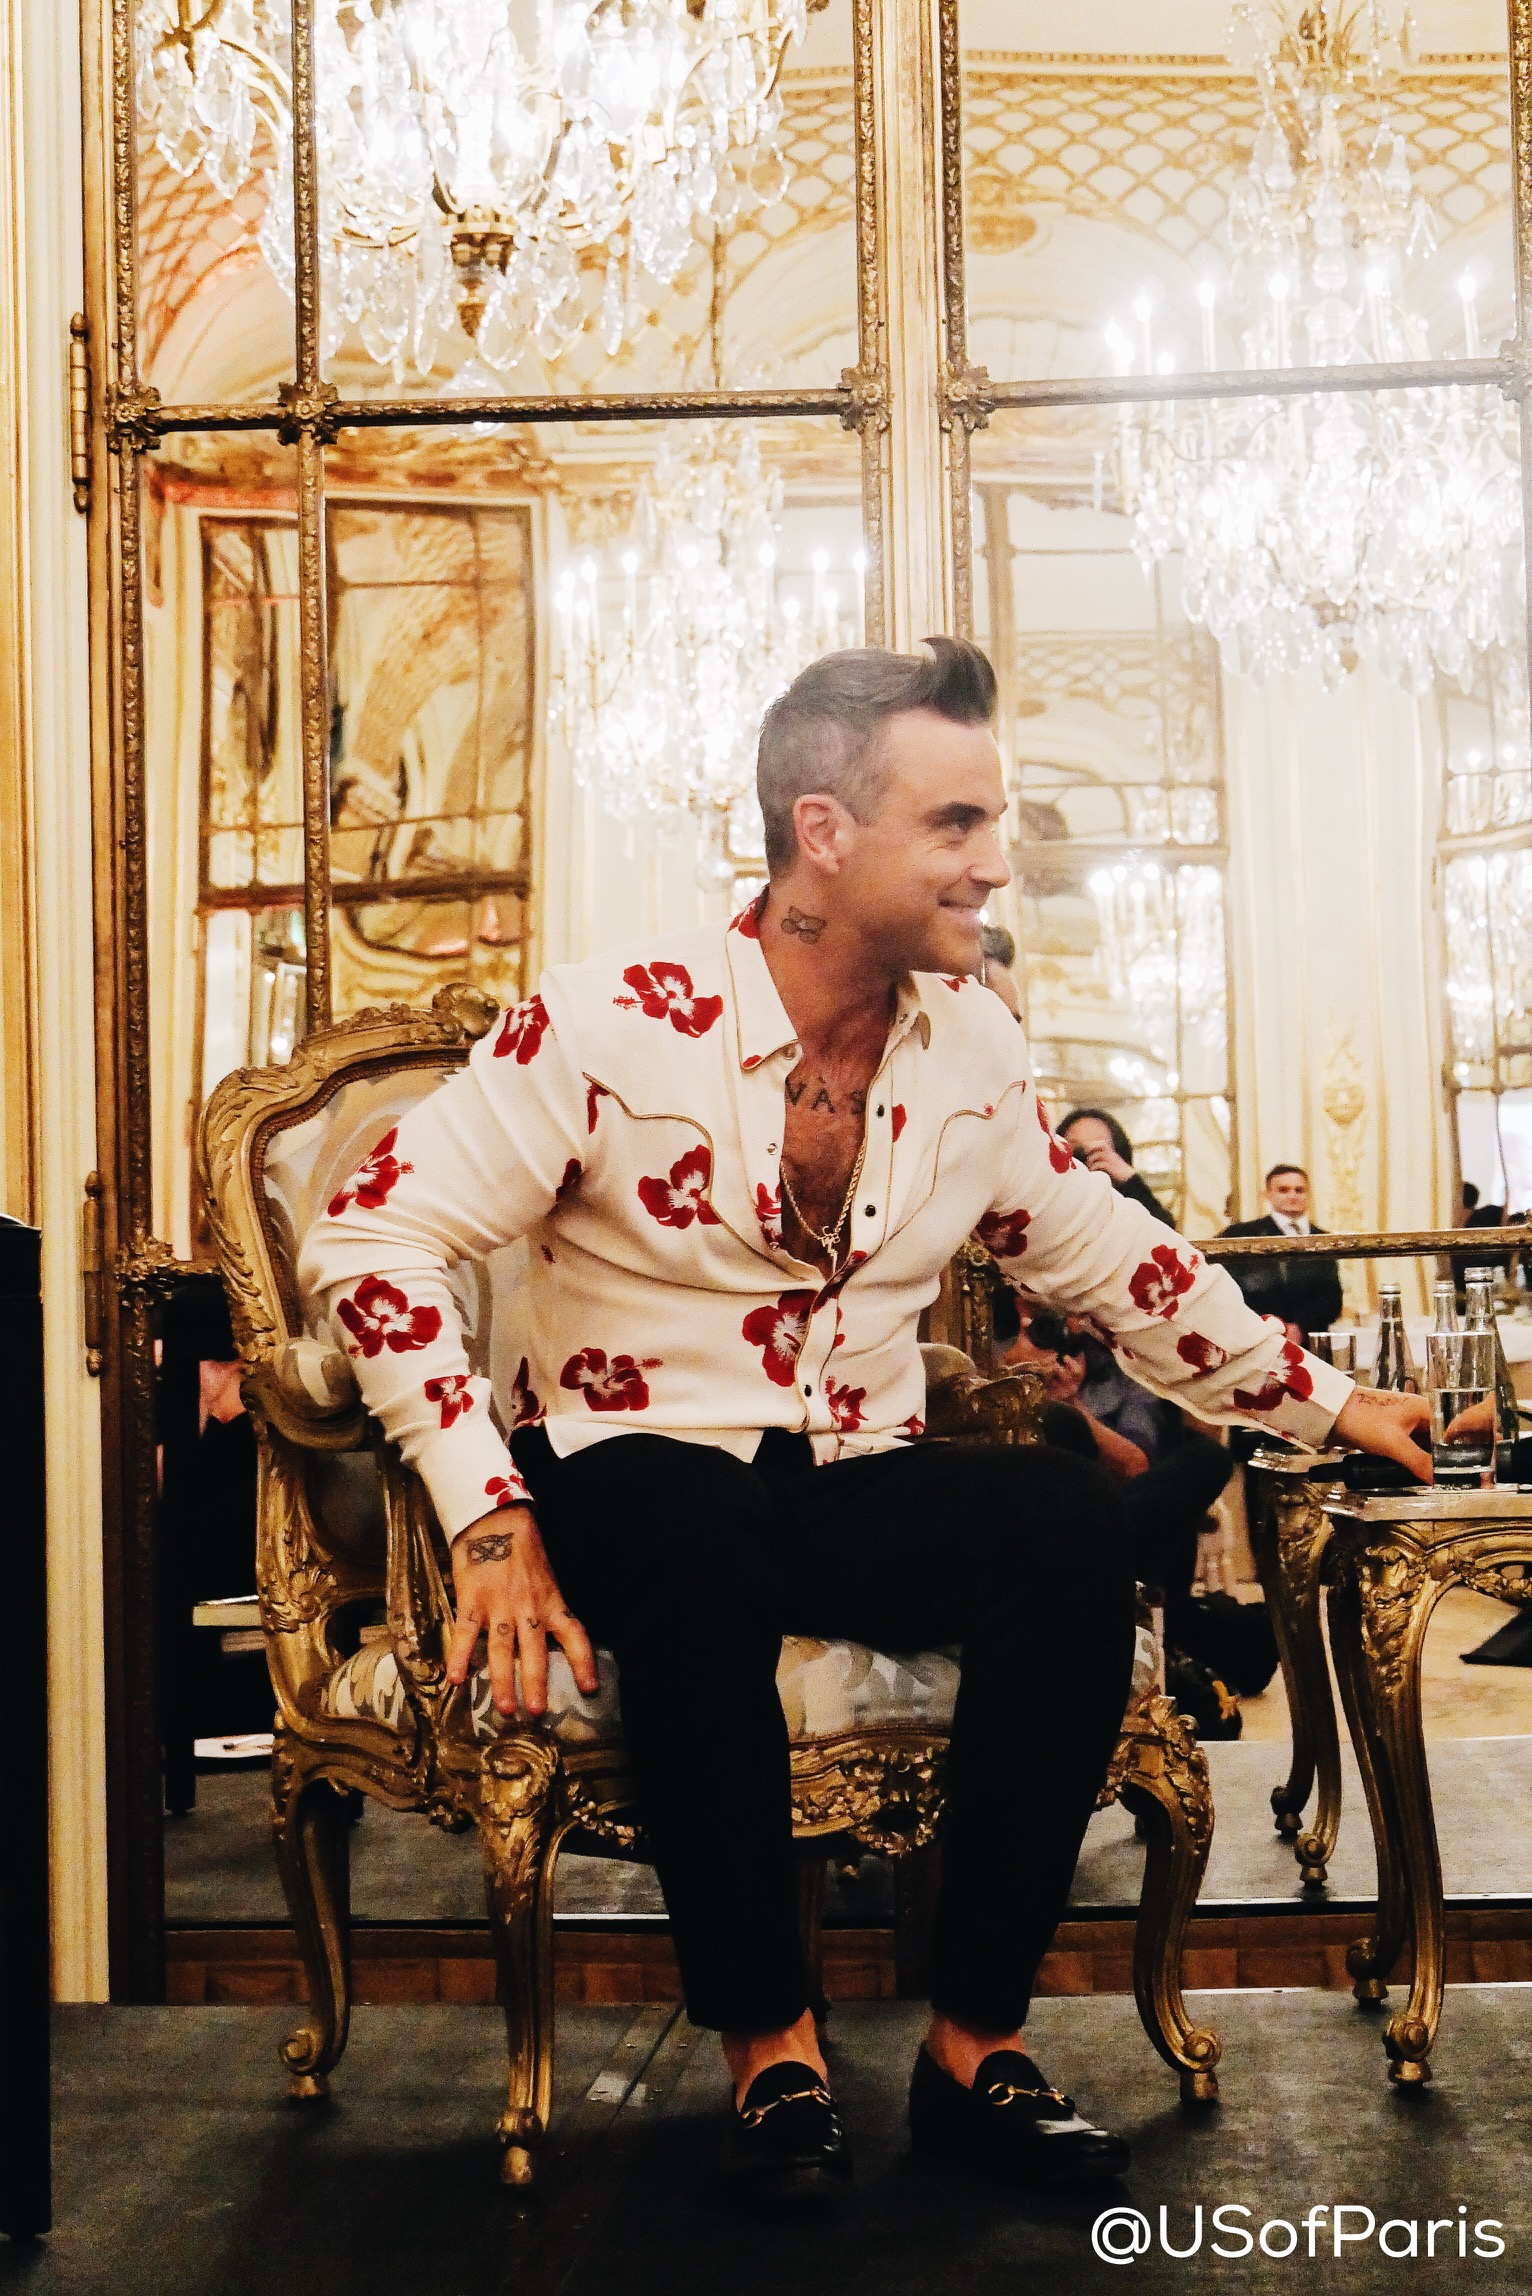 robbie-williams-smile-the-heavy-entertainment-show-album-interview-paris-le-meurice-photo-usofparis-blog